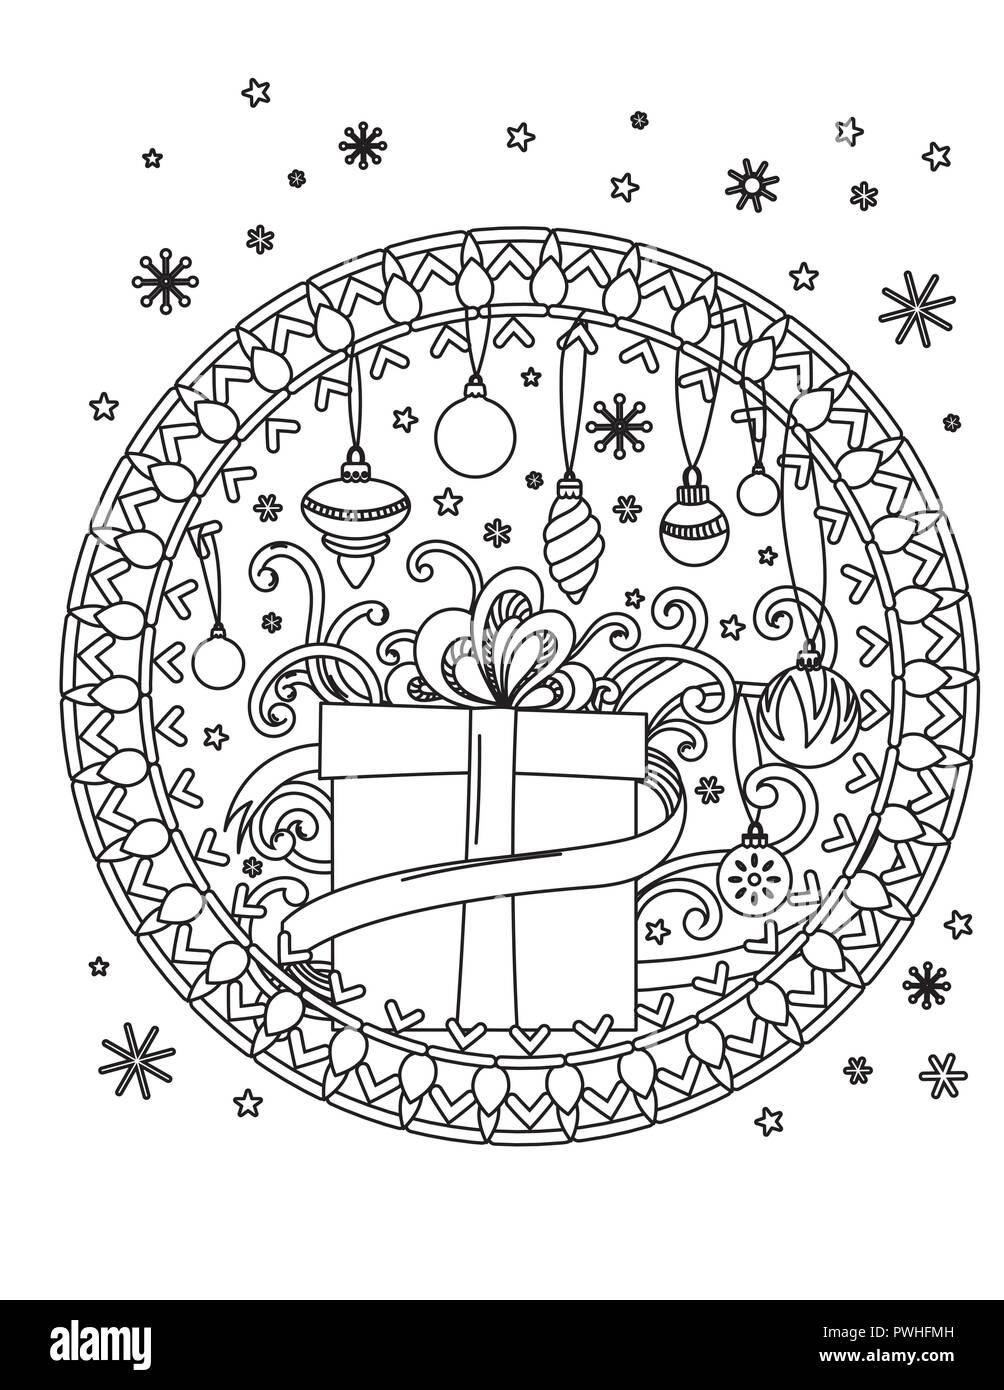 Christmas Mandalas : christmas, mandalas, Christmas, Mandala, Coloring, Page., Adult, Book., Holiday, Decore,, Gifts,, Balls, Ribbond., Drawn, Vector, Illustration, Stock, Image, Alamy